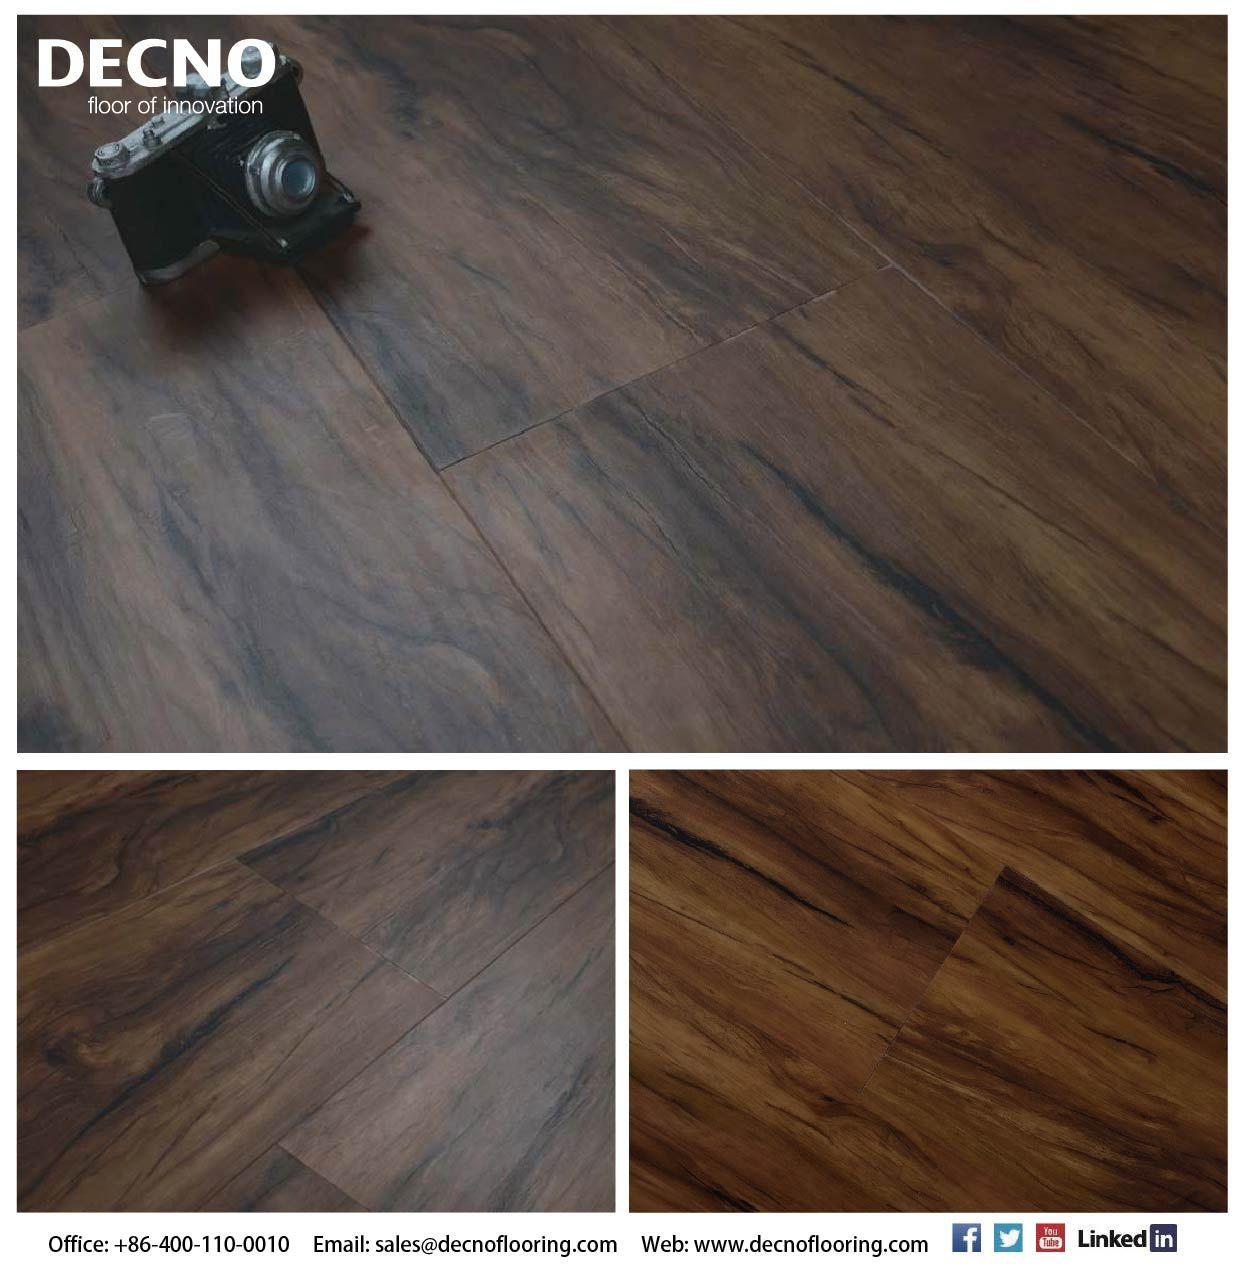 Spc Flooring Is An Upgrade Ofvinyl Flooring Products It